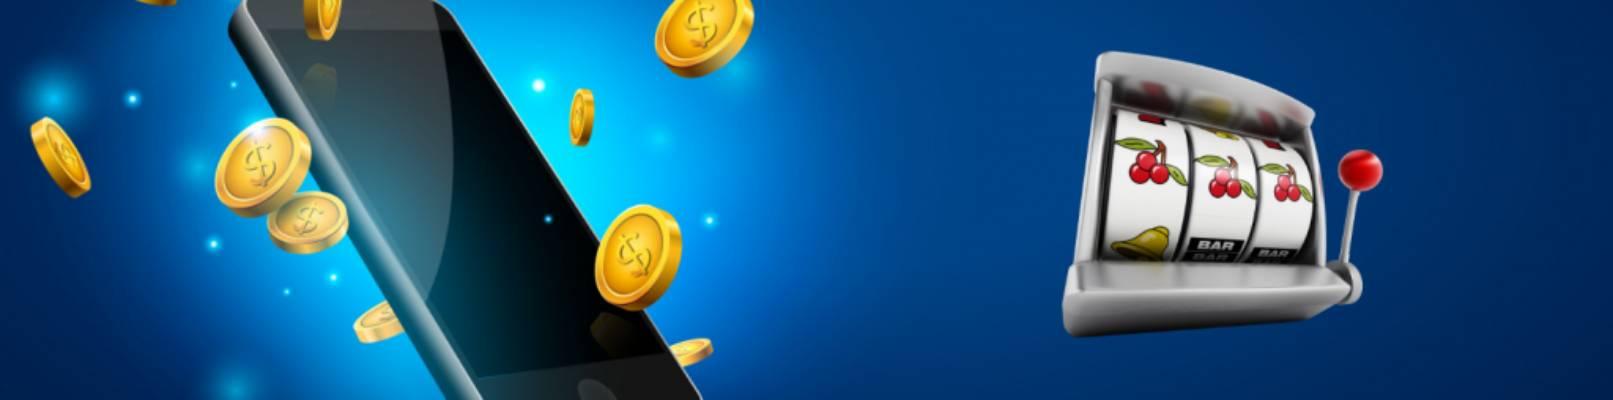 maxbet casino online pe mobil